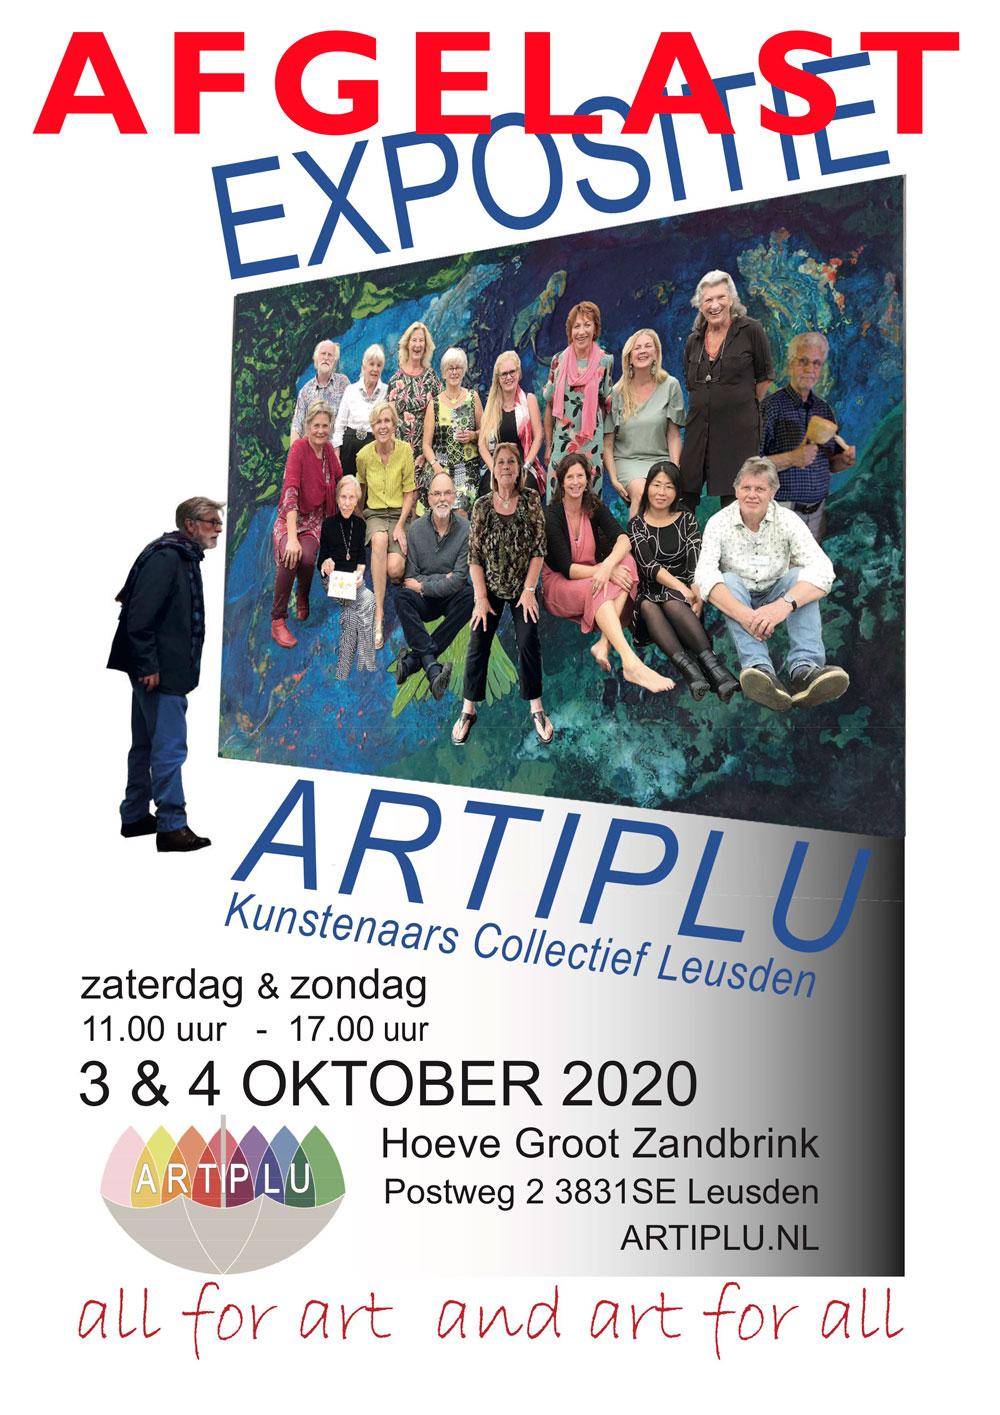 Artiplu groepsexpositie -afgelast- @ Hoeve Groot Zandbrink